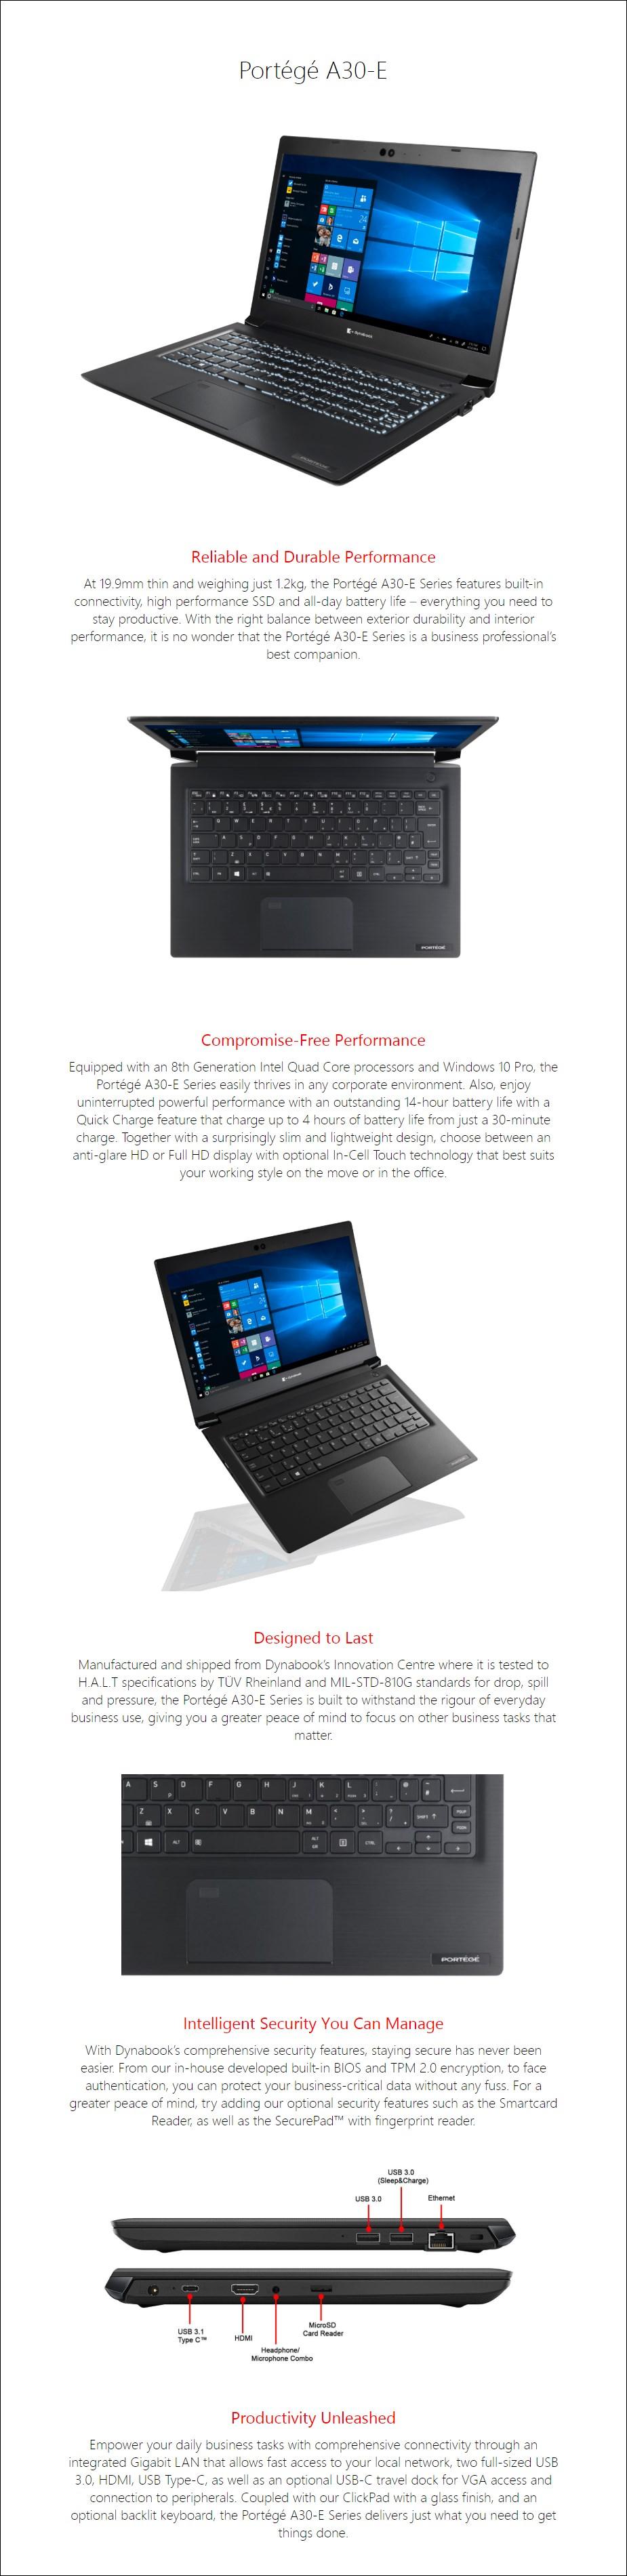 "Toshiba dynabook Portege A30-E 13.3"" Laptop i5-8250U 8GB 256GB W10P - Overview 1"